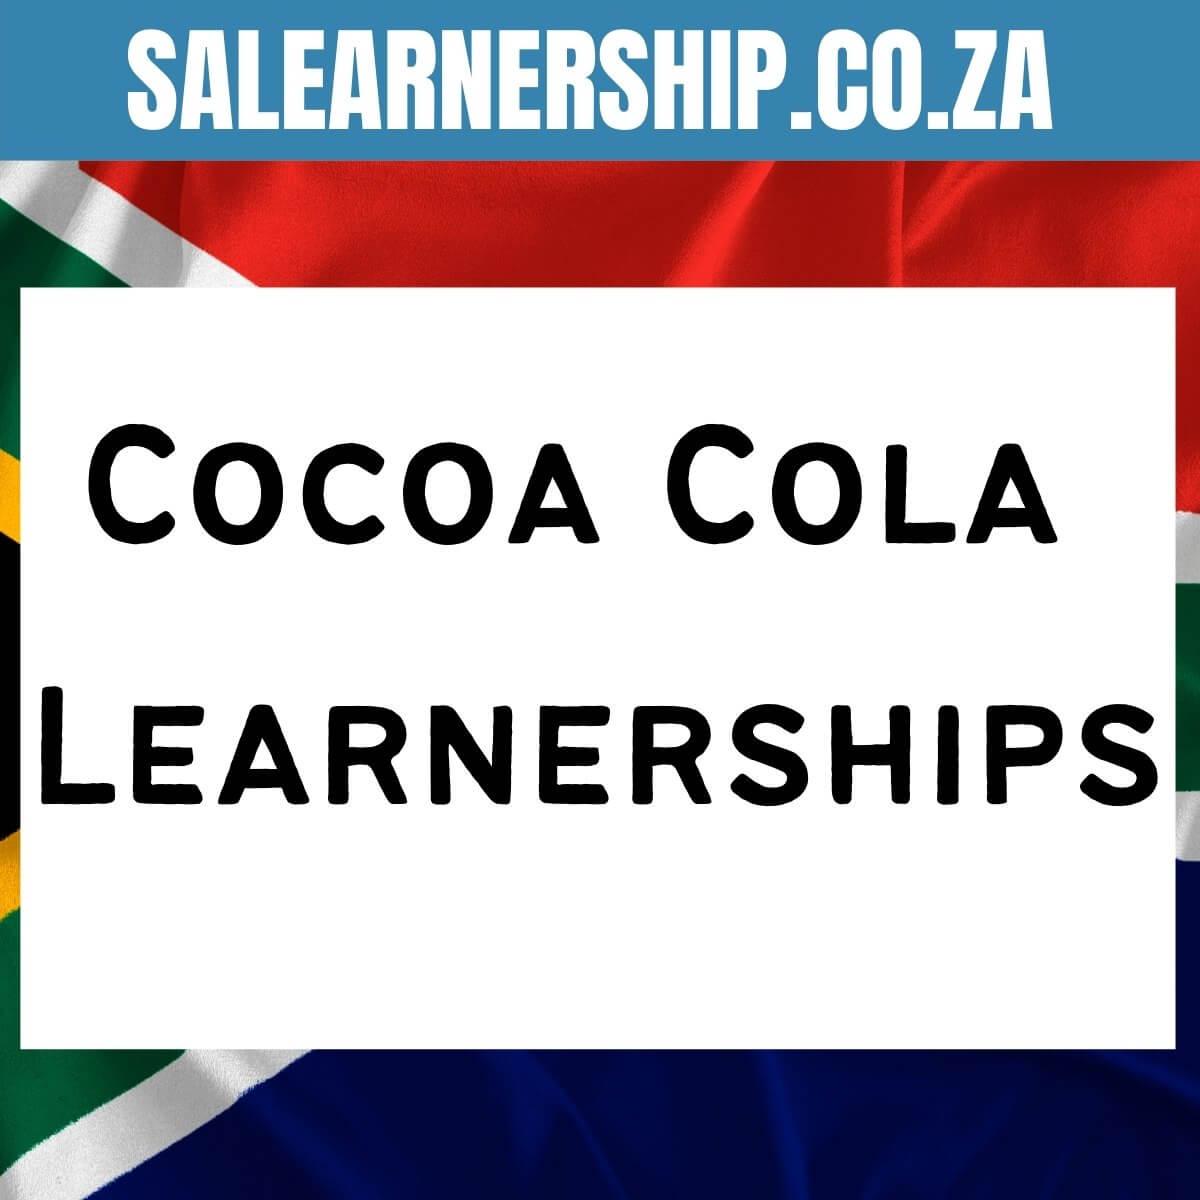 coca cola learnerships